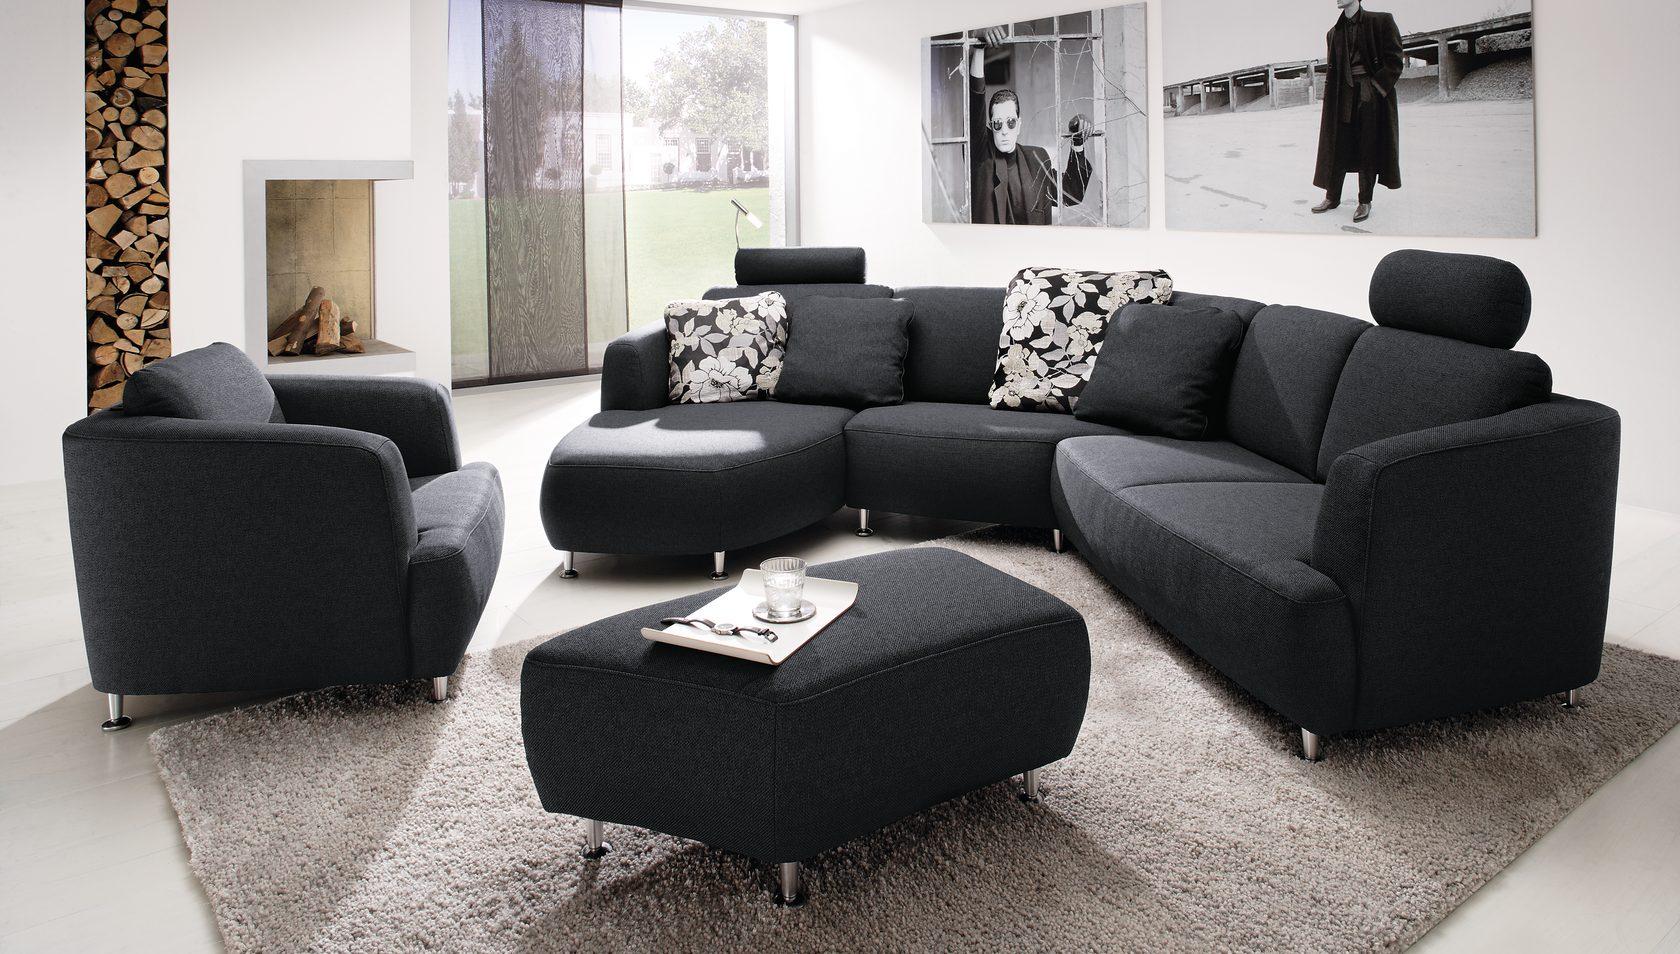 Ol ron meubles mr150 ol ron meubles for Meubles oleron